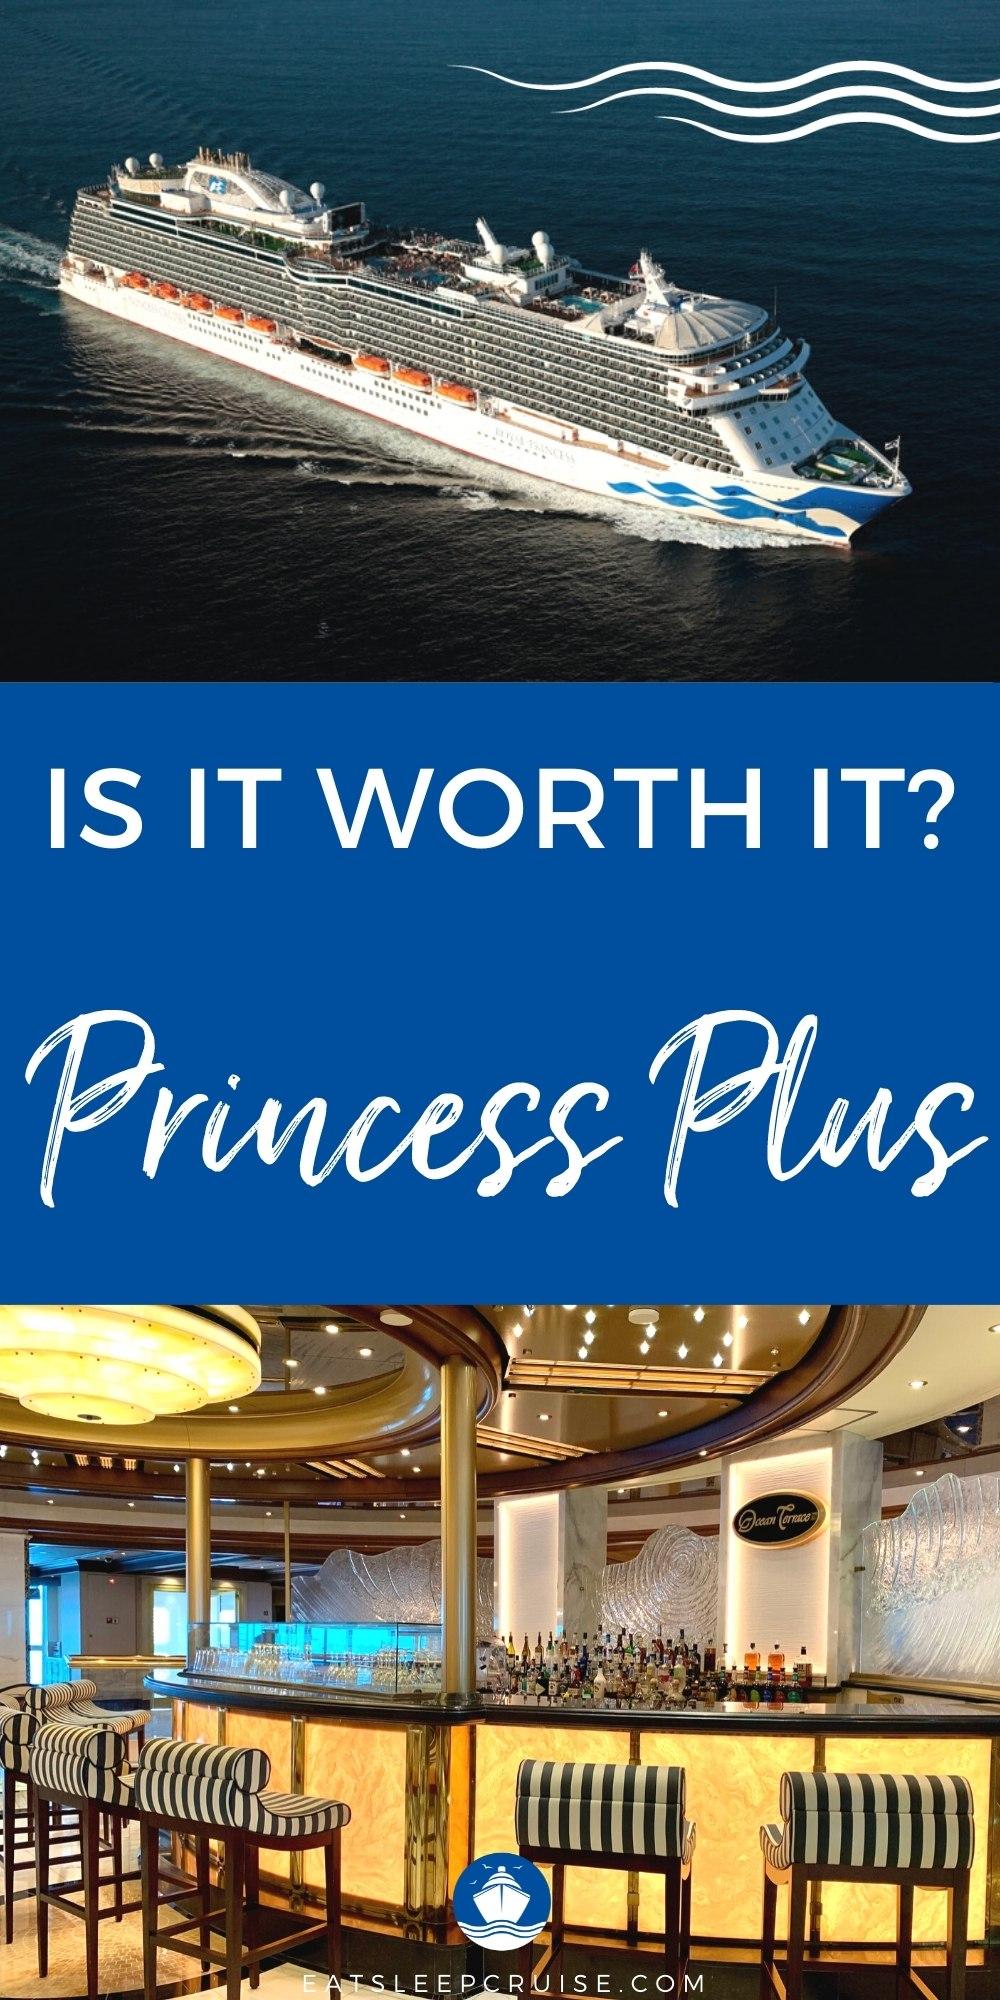 Is Princess Plus Worth It?